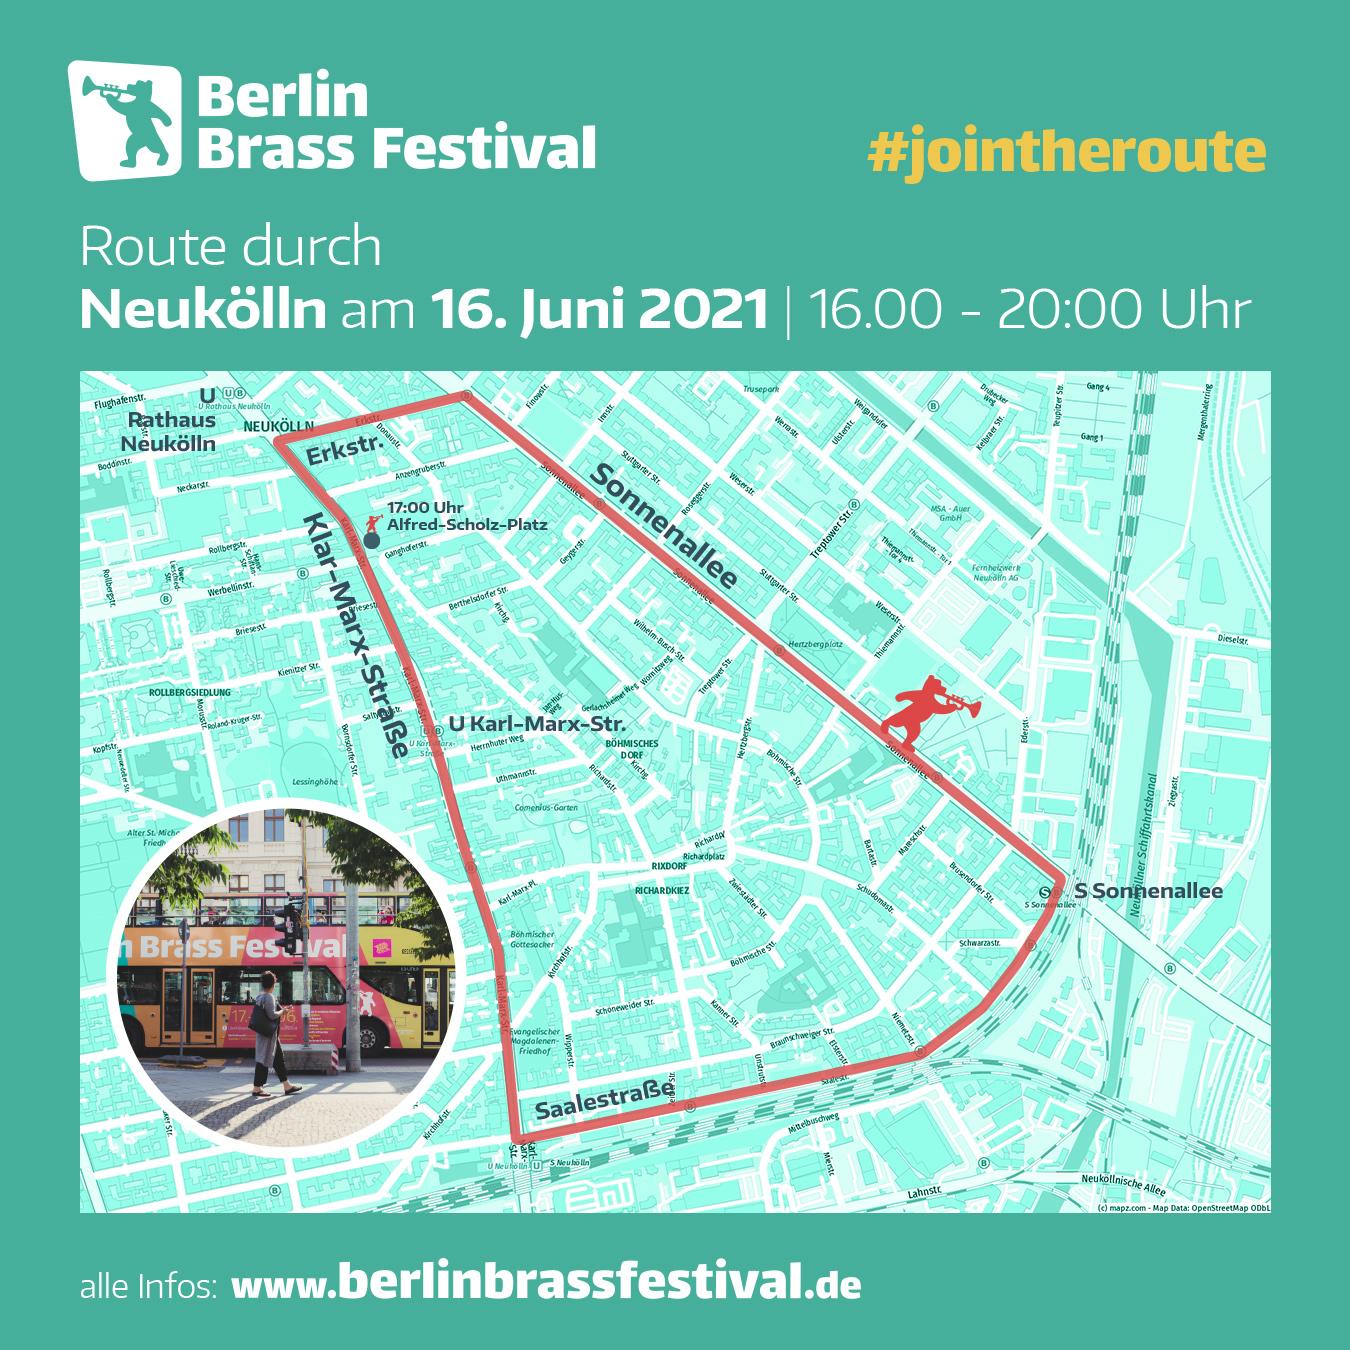 Berlin Brass Festival 2021 Route Neukoelln